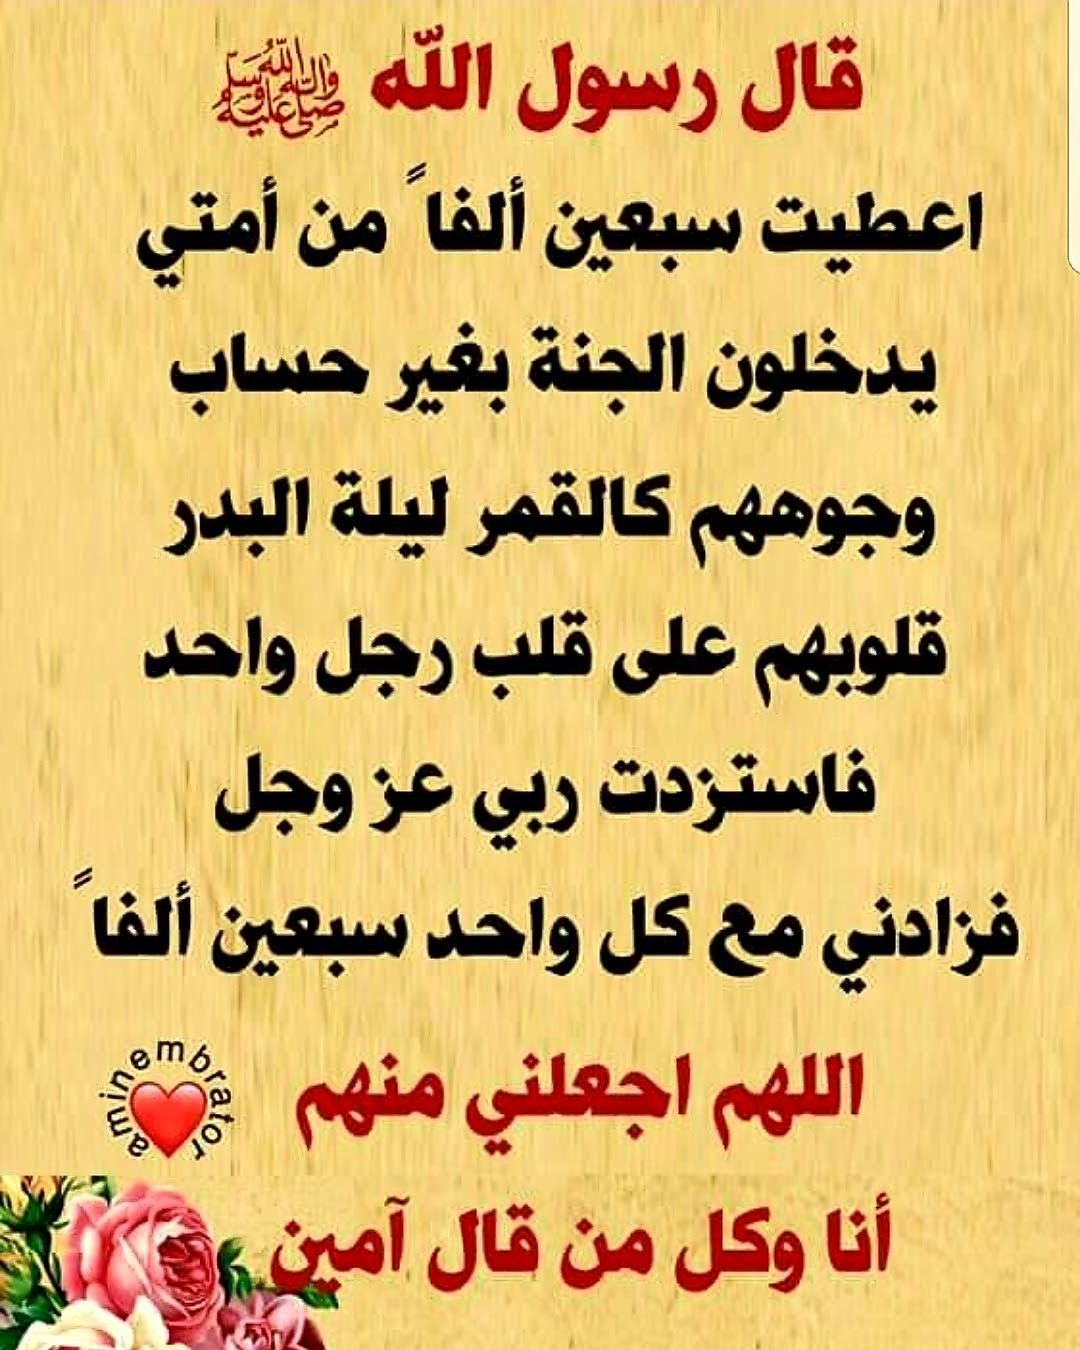 Pin By The Noble Quran On I Love Allah Quran Islam The Prophet Miracles Hadith Heaven Prophets Faith Prayer Dua حكم وعبر احاديث الله اسلام قرآن دعاء Arabic Calligraphy Quotes